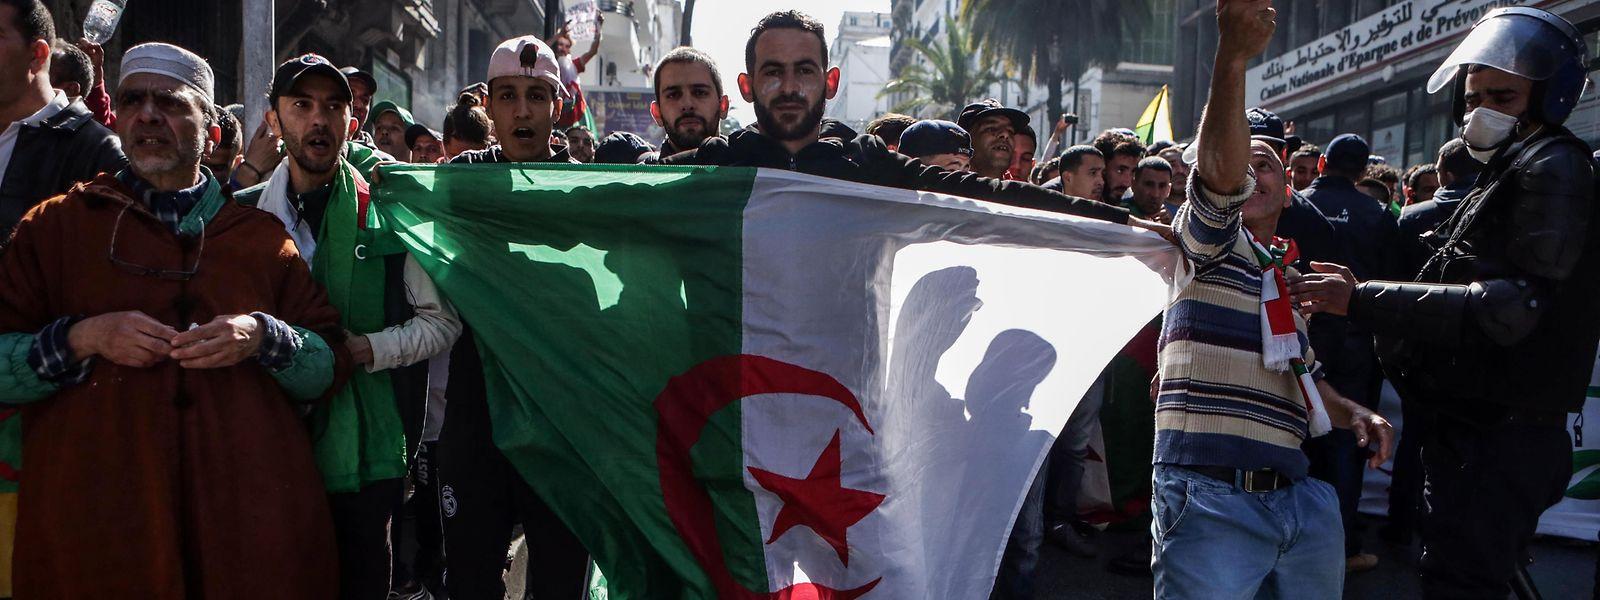 Anti-Regierungs-Demonstration in Algiers.